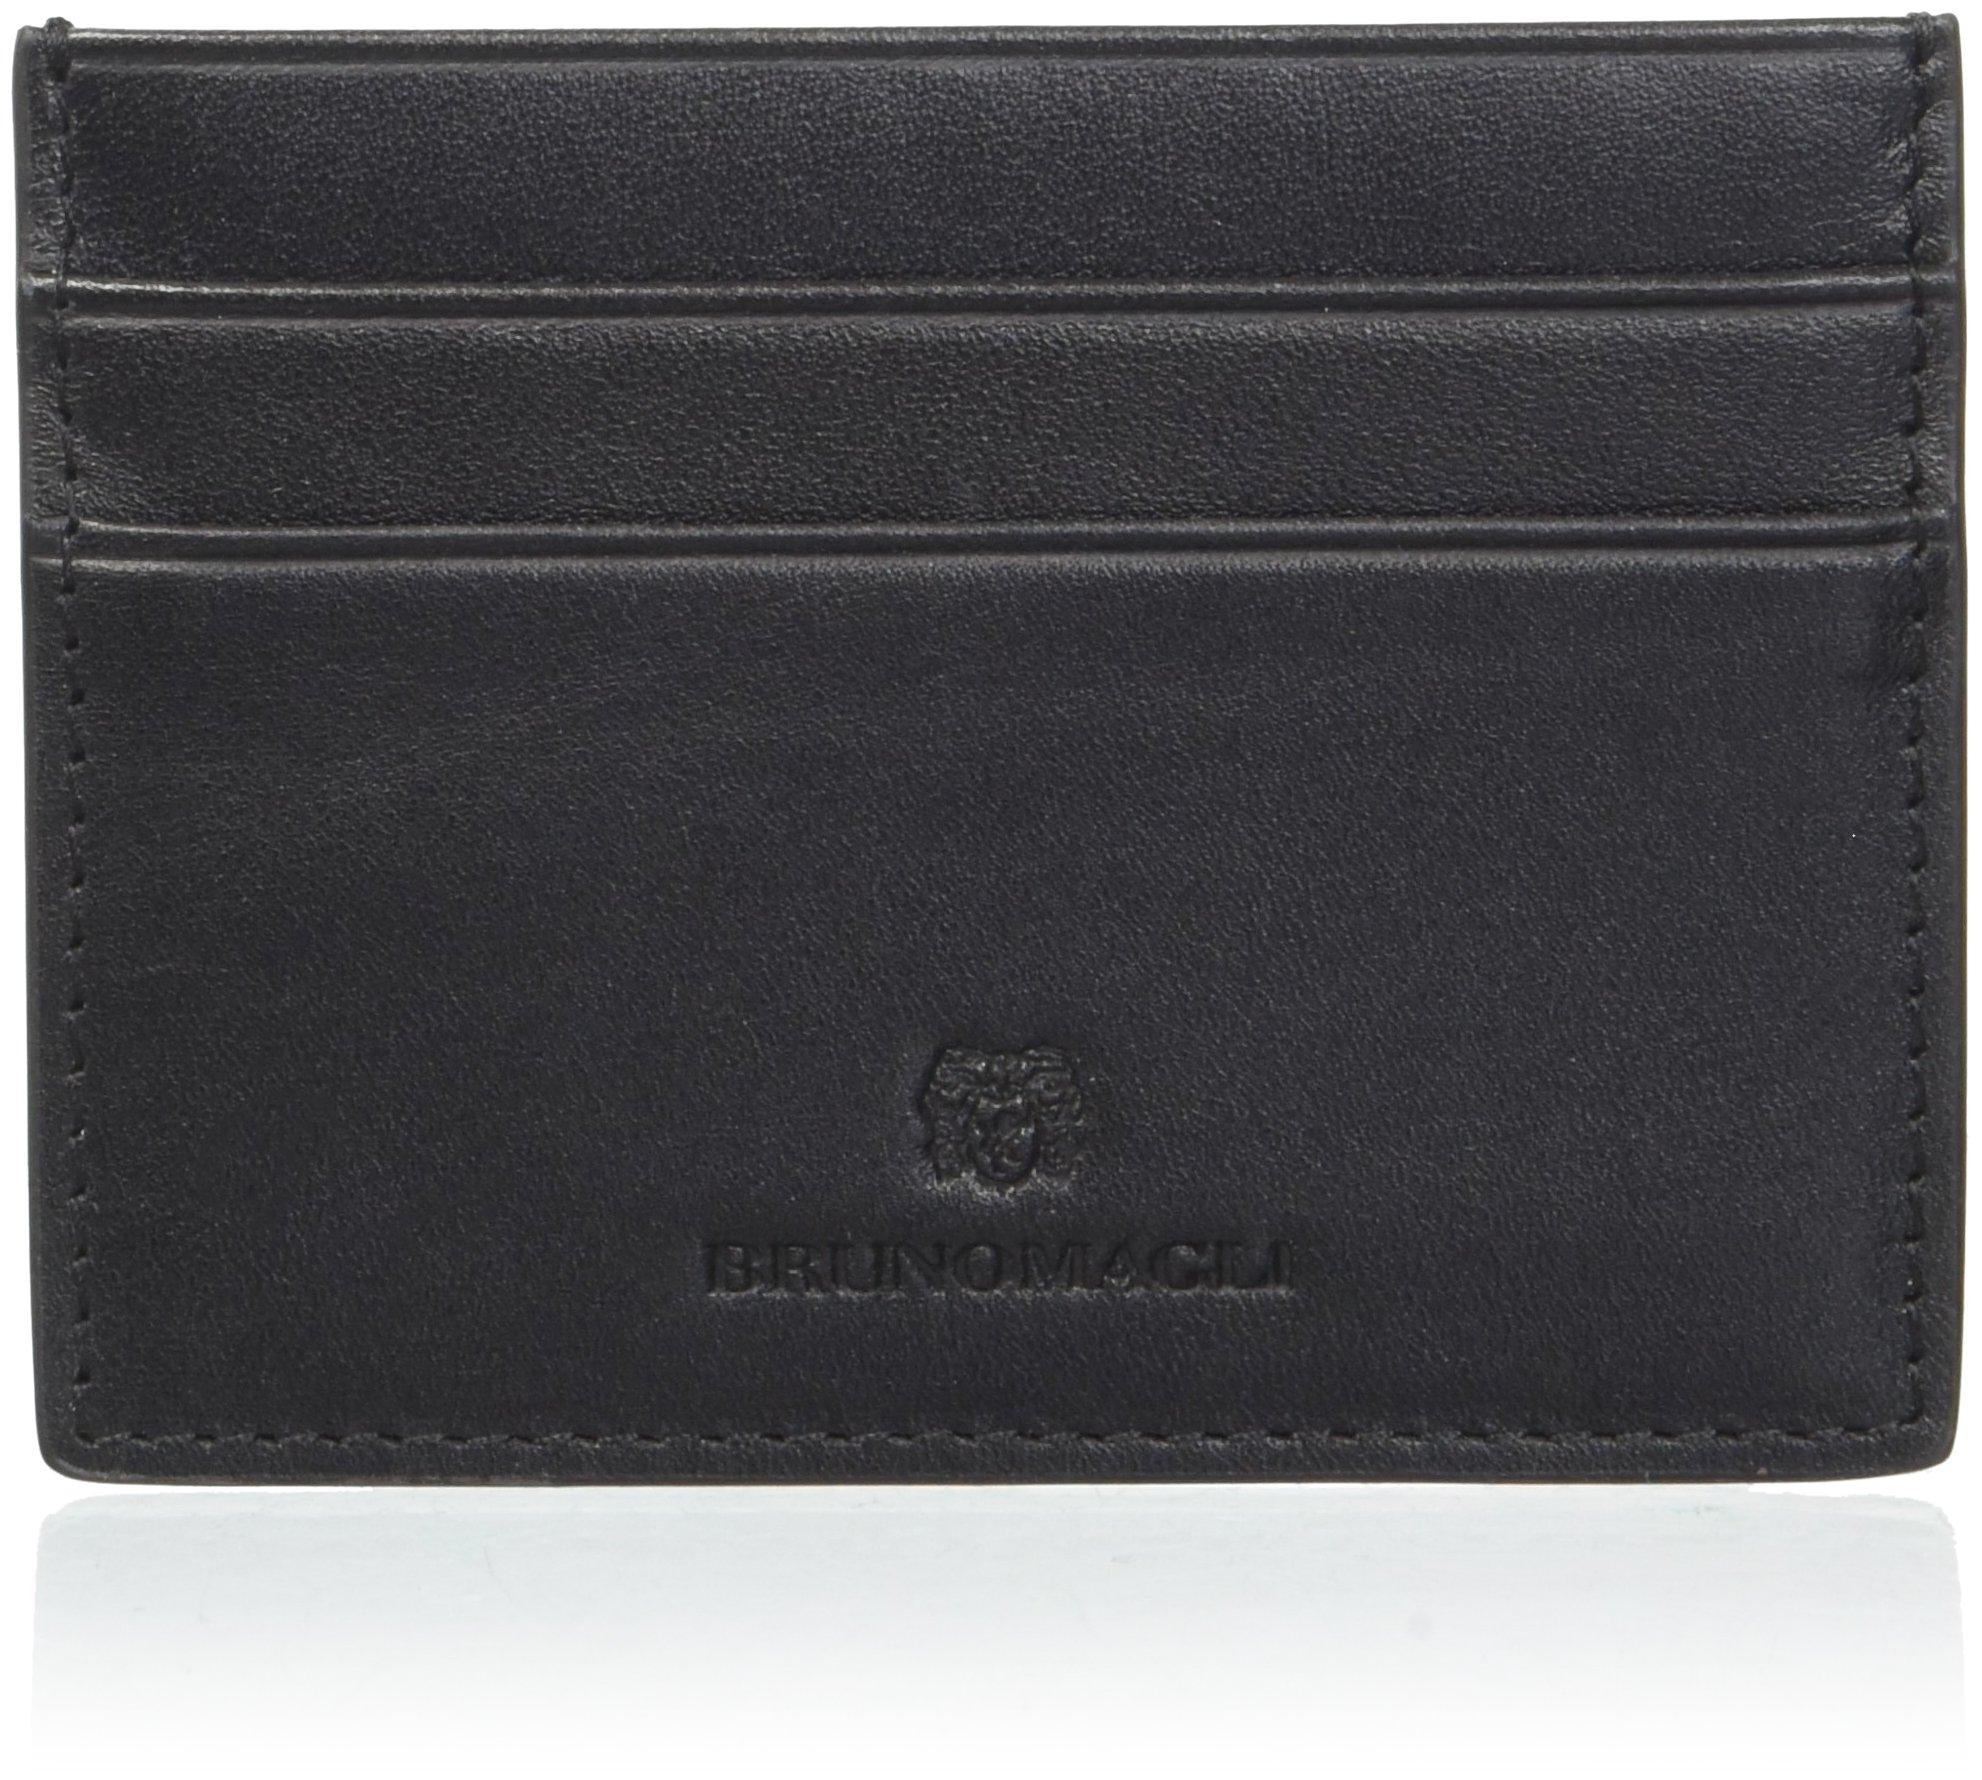 Bruno Magli Men's Flat Card Case Accessory, -black, One Size